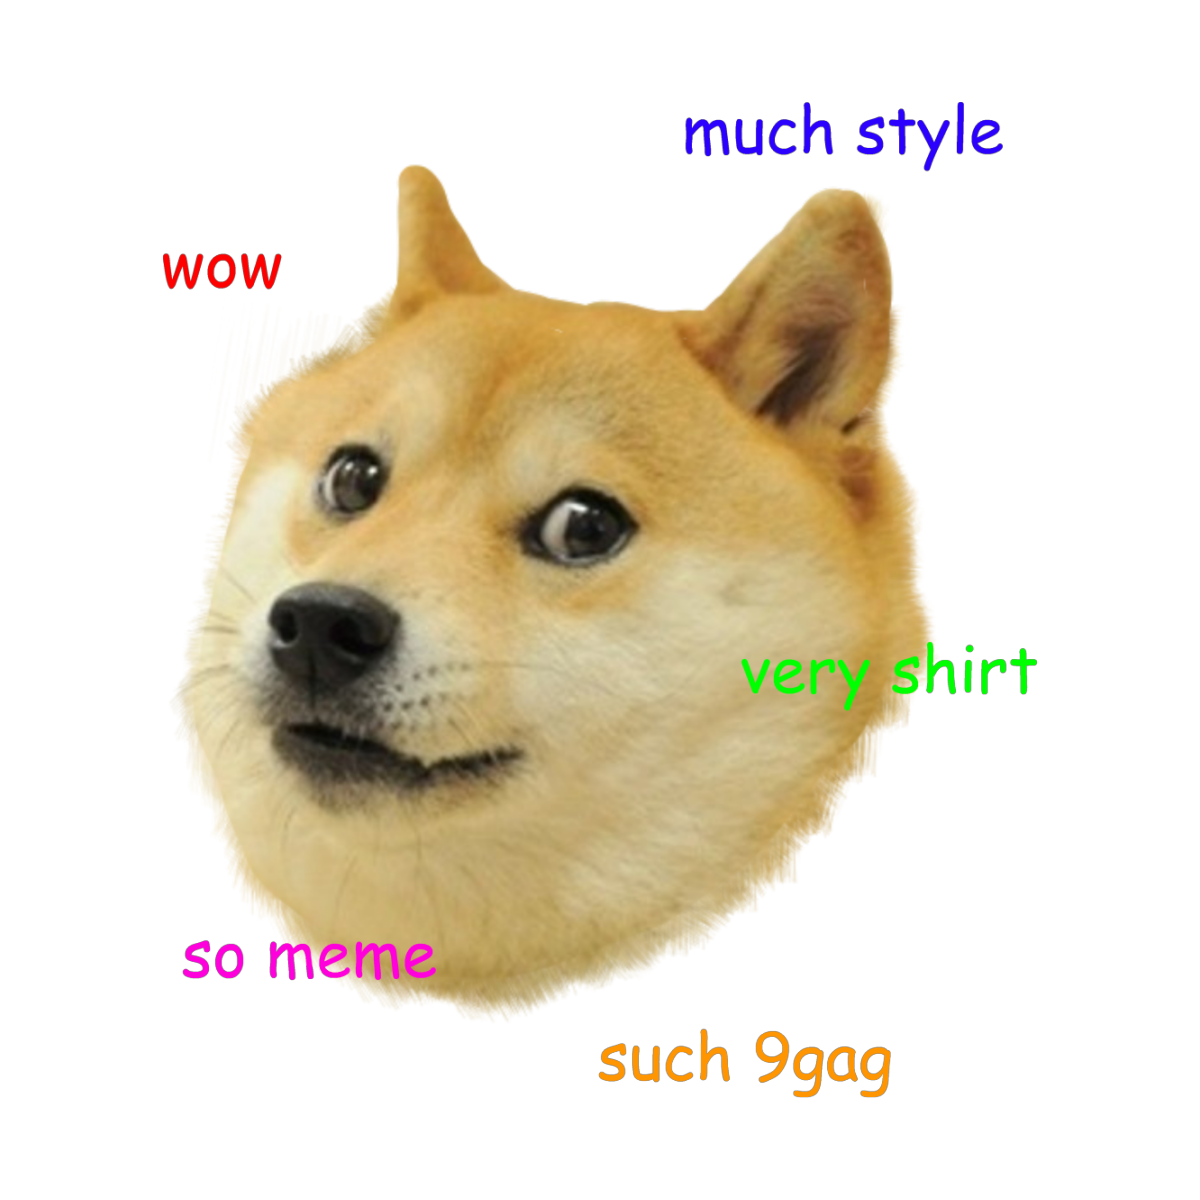 Doge Shibe Shiba Inu Meme Design 9gag Merch In 2021 Doge Shiba Inu Meme Design